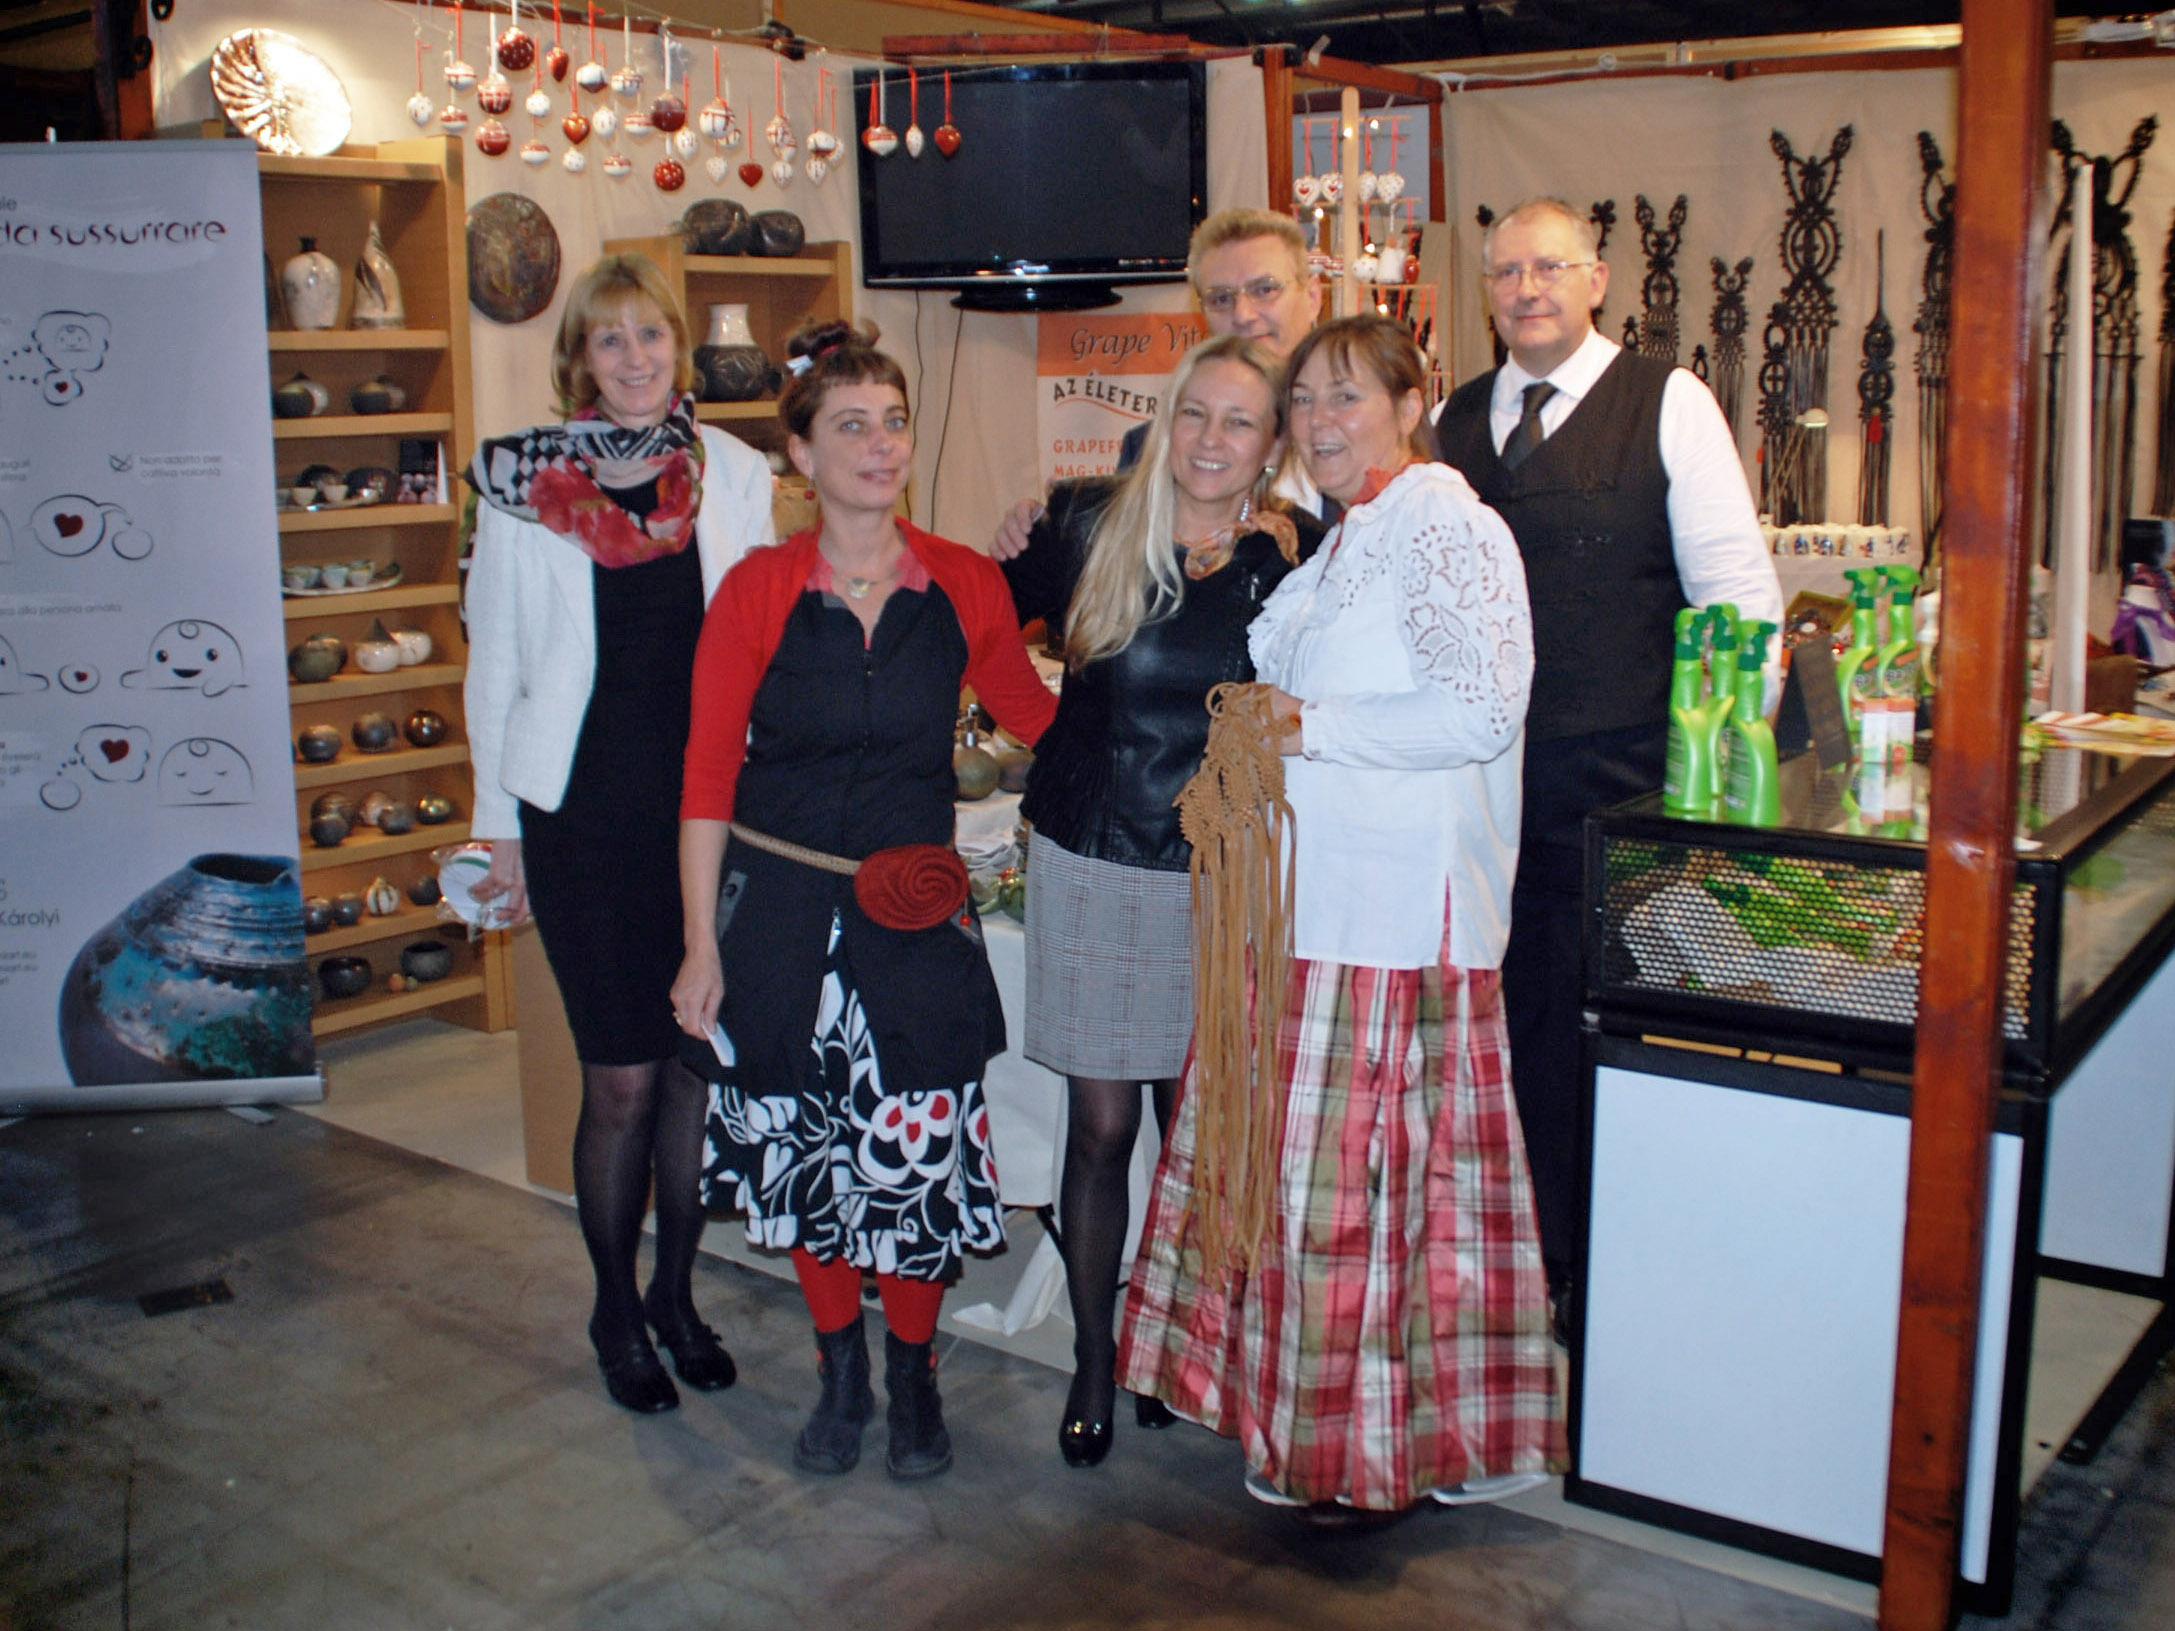 A Great Team (Katalin Egri, Ildikó Károlyi, Judit Timaffy, Zsolt Dr. Csabai, Kati Andrejszki and Filippo Farkas) - L'Artigiano in Fiera: Exhibition and Fair in Milan